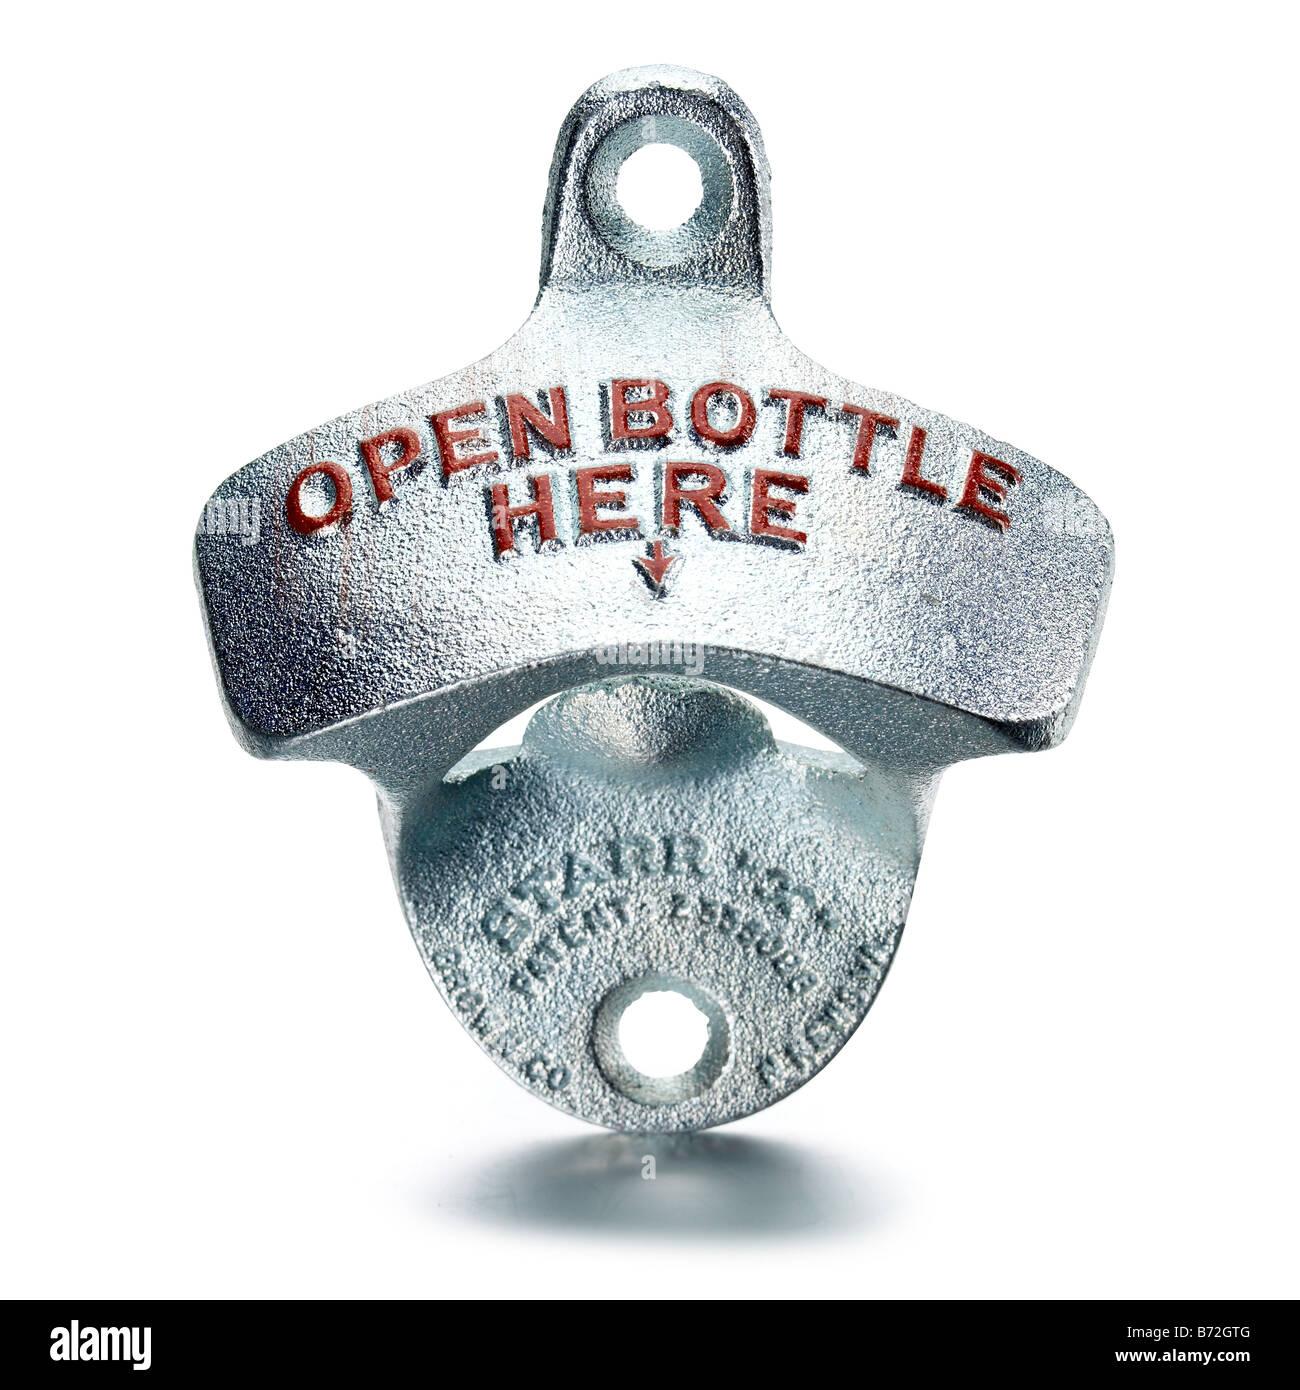 metal bottle opener - Stock Image